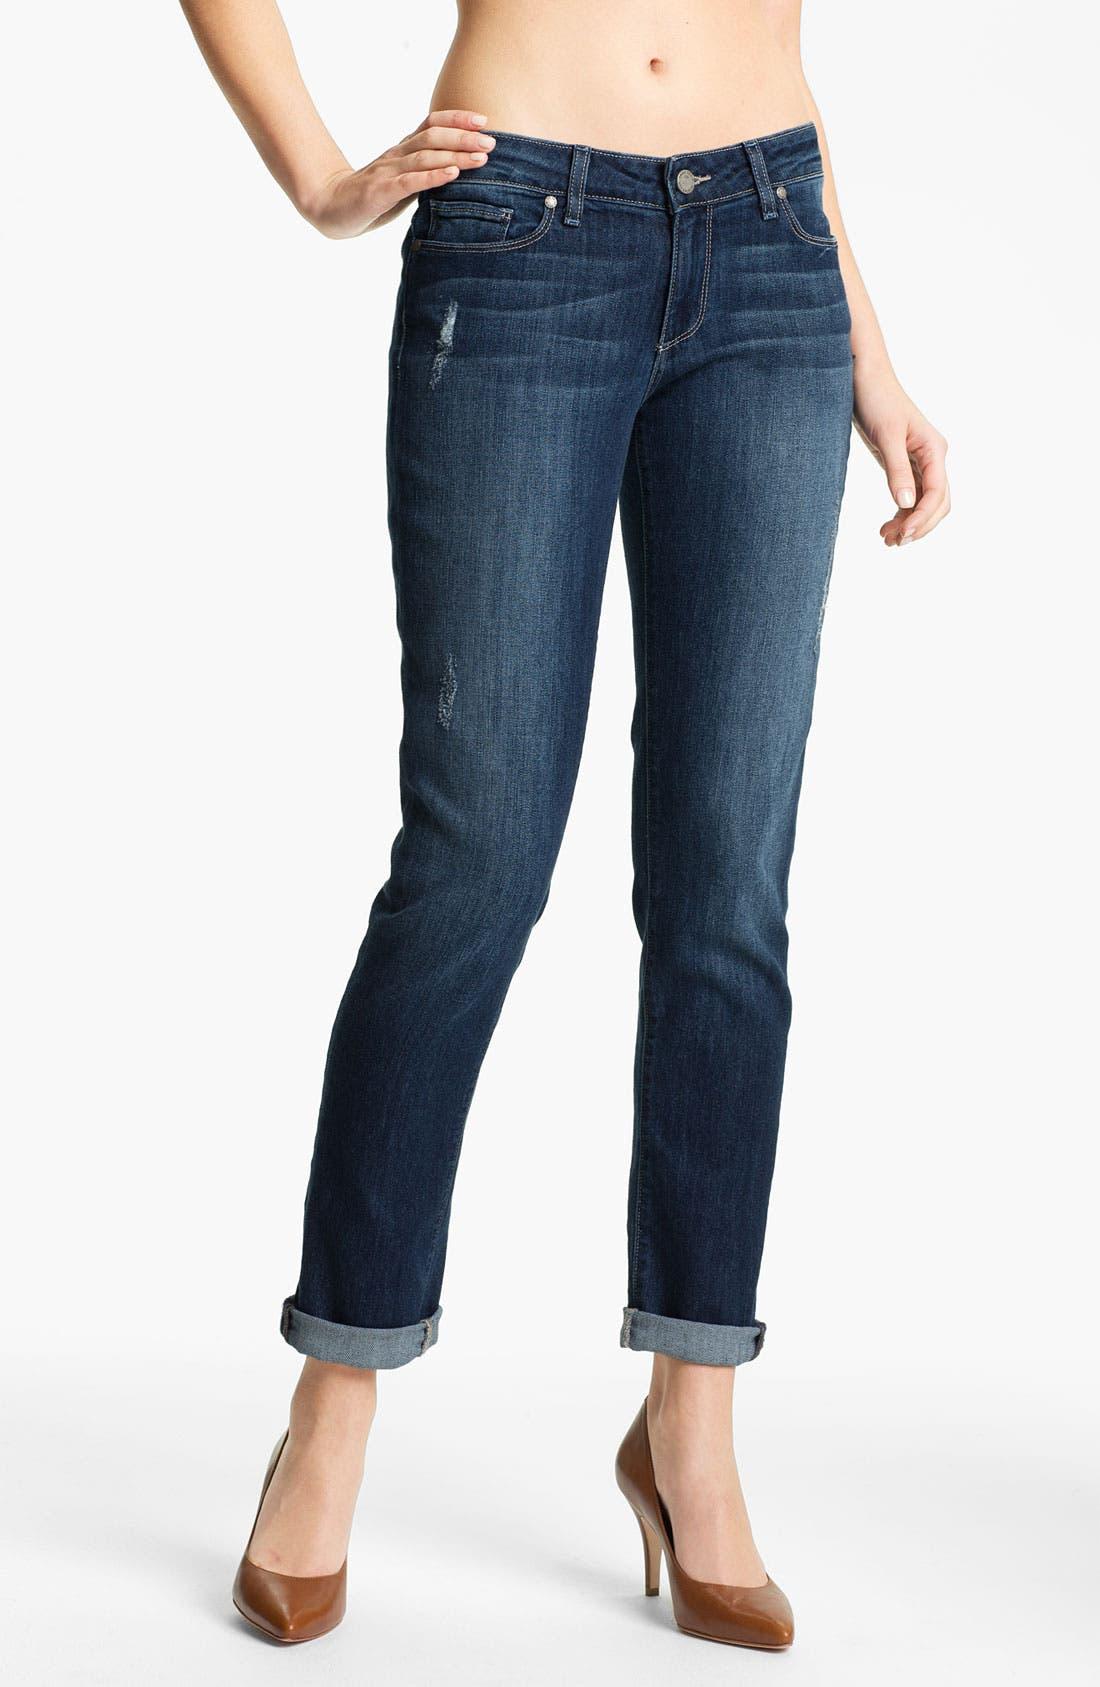 Denim 'Jimmy Jimmy' Distressed Skinny Jeans,                         Main,                         color, Mandi Destruction